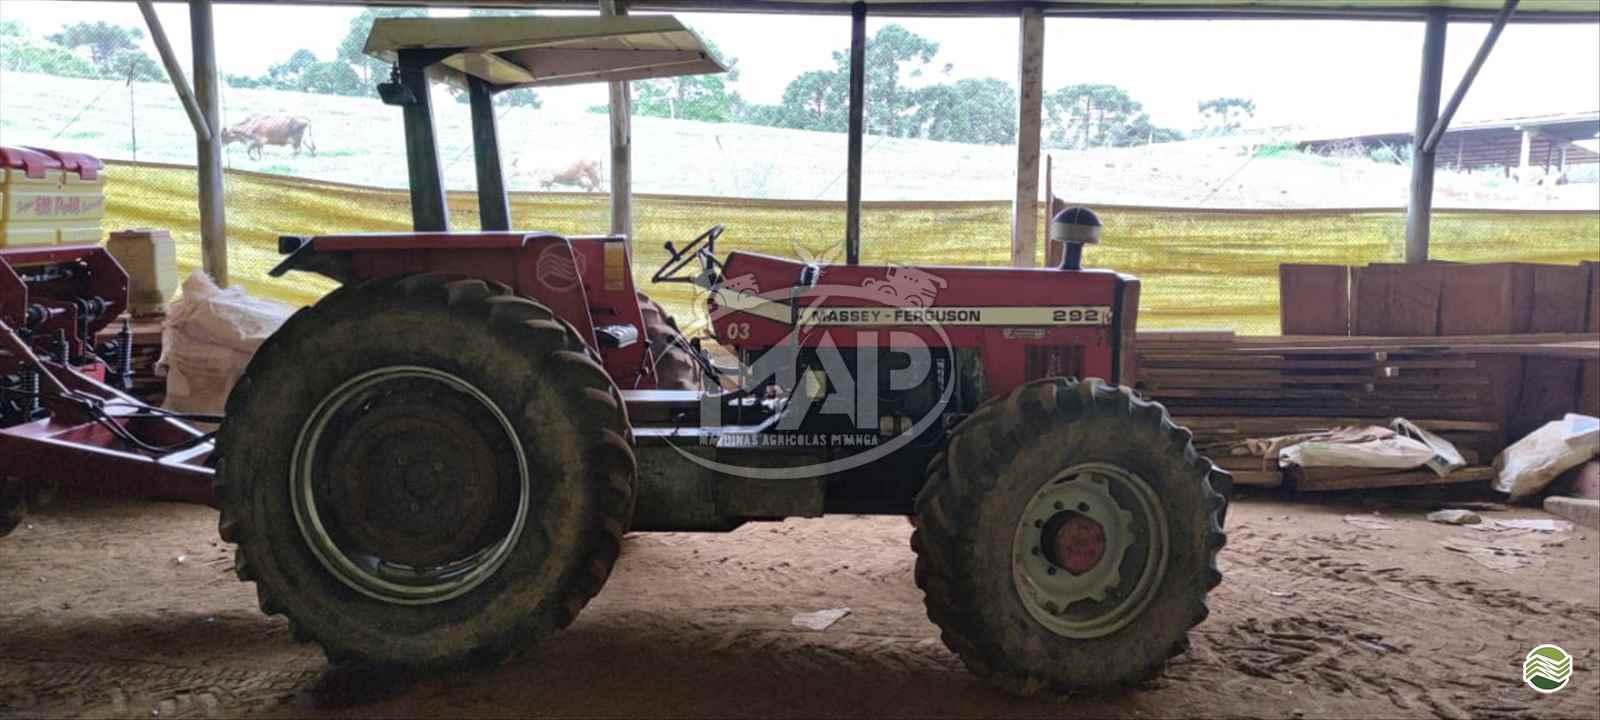 TRATOR MASSEY FERGUSON MF 292 Tração 4x4 Máquinas Agrícolas Pitanga PITANGA PARANÁ PR